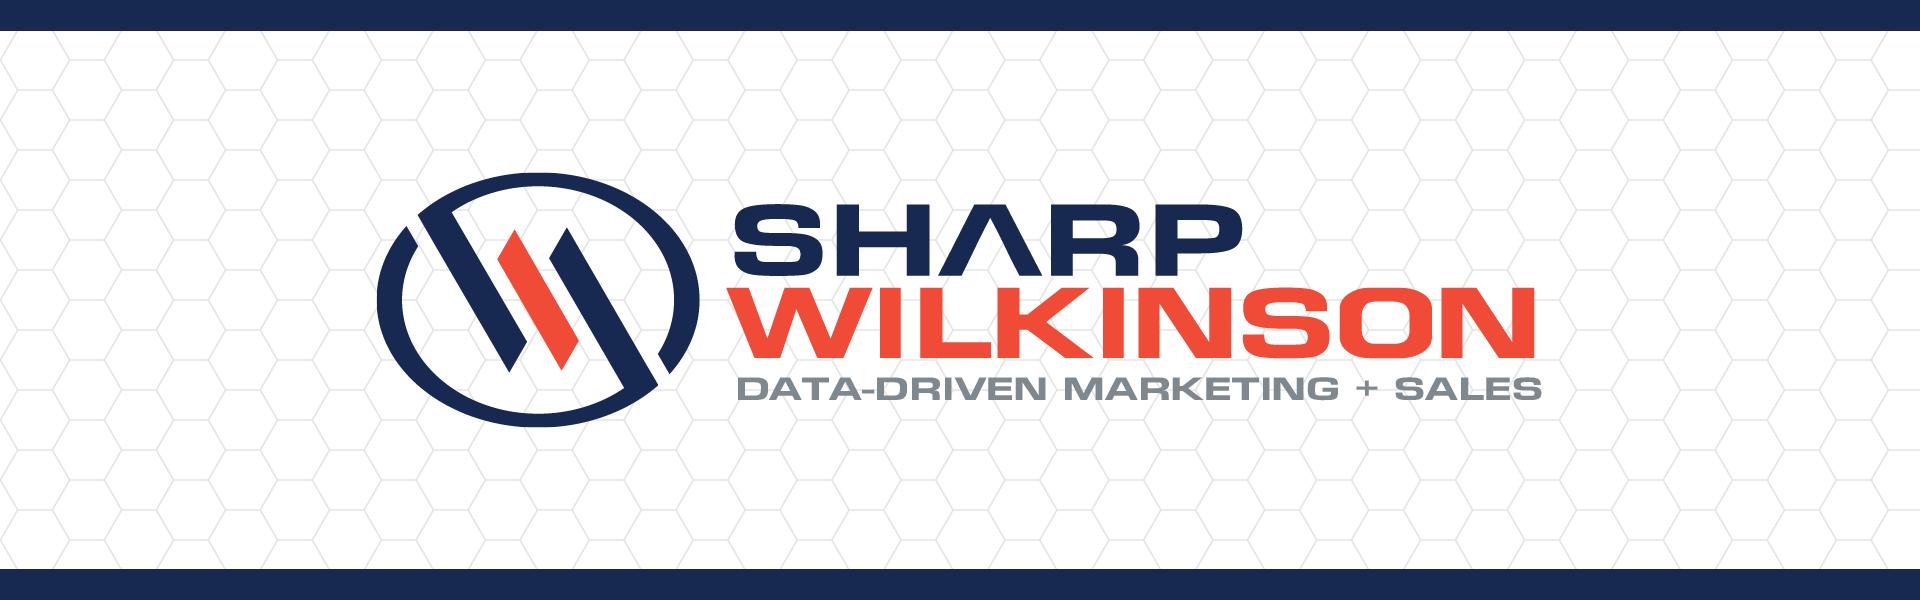 Sharp Wilkinson